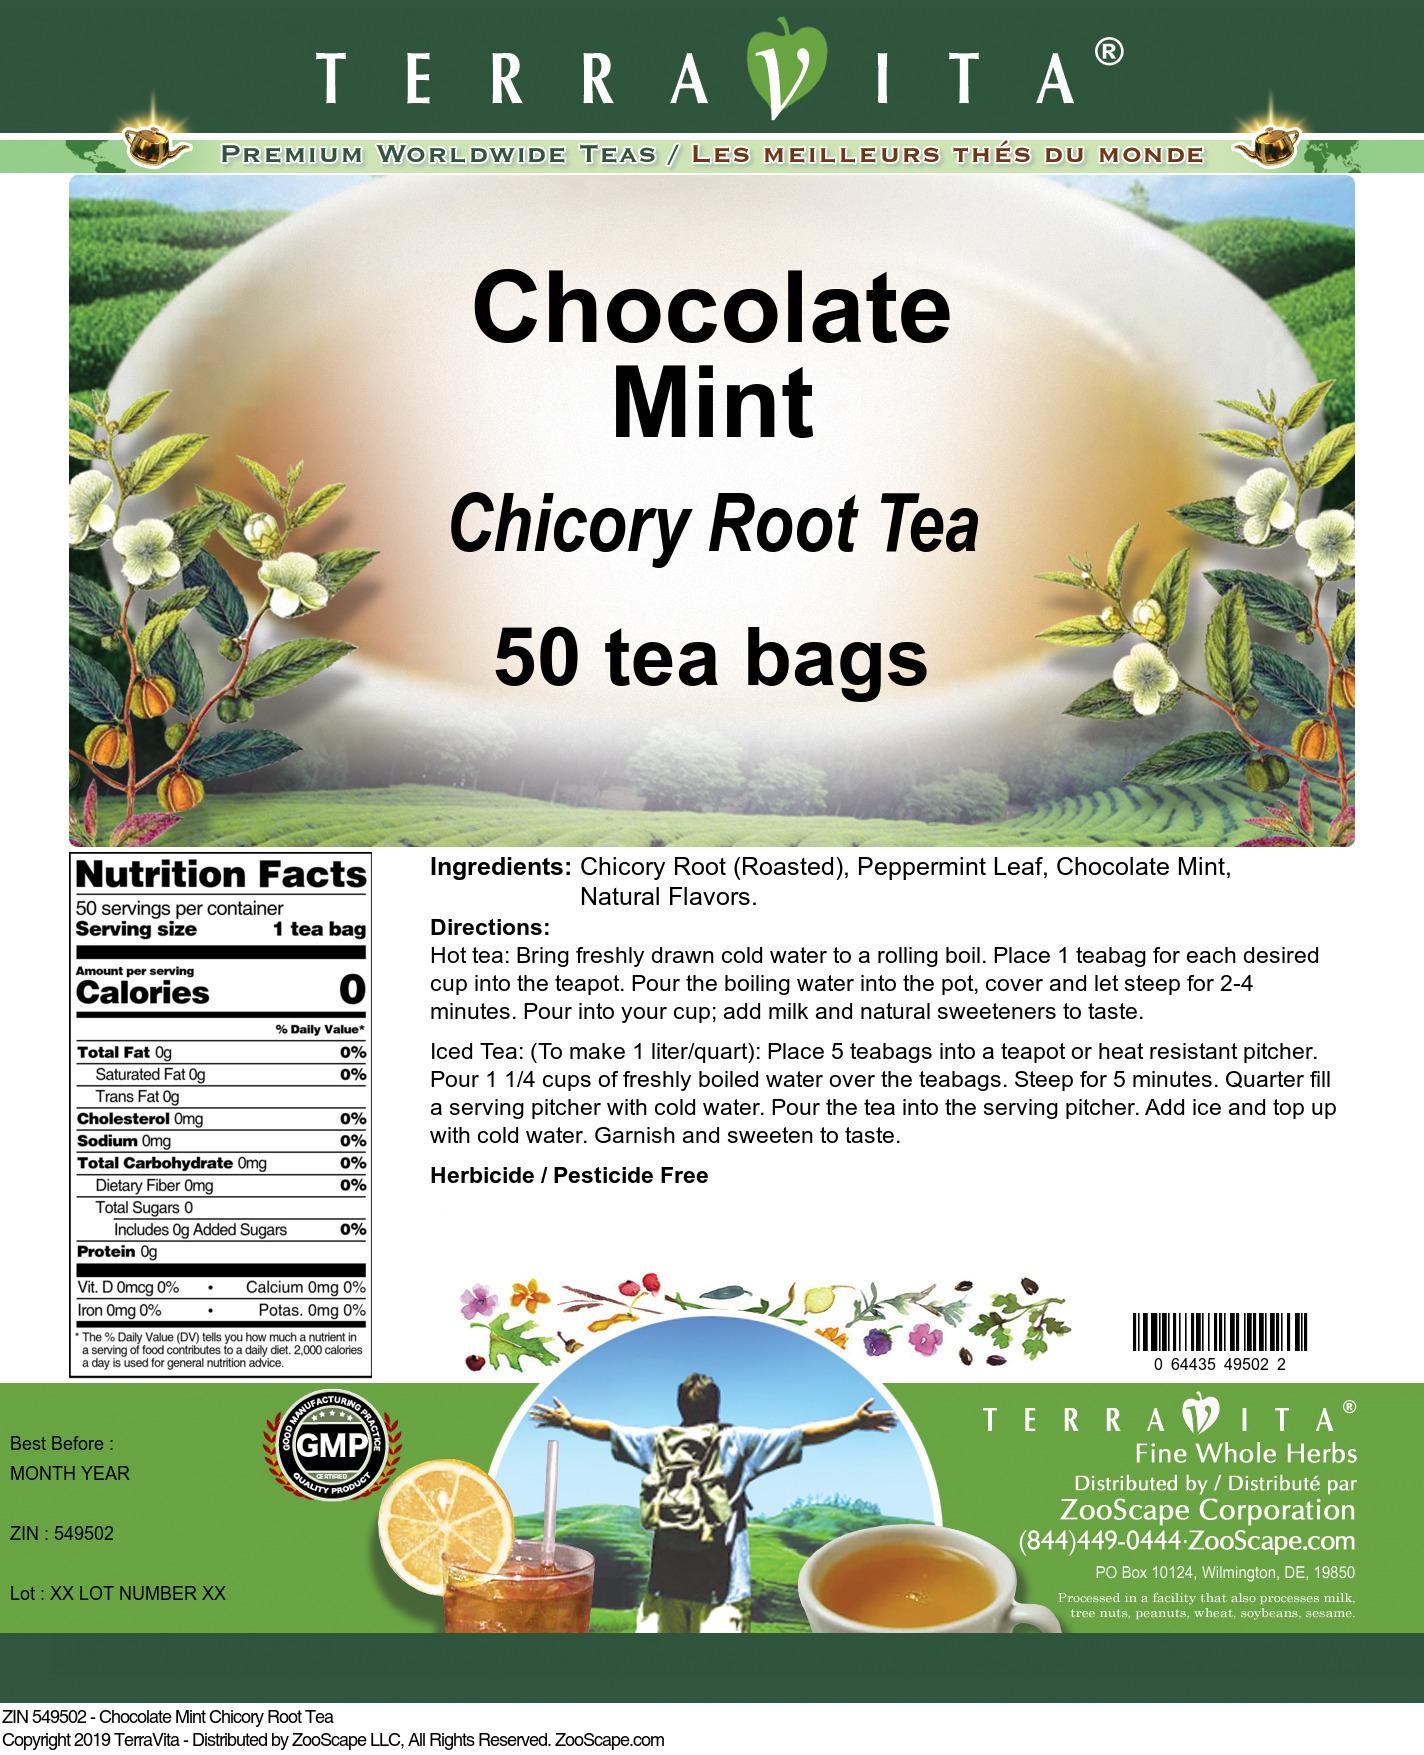 Chocolate Mint Chicory Root